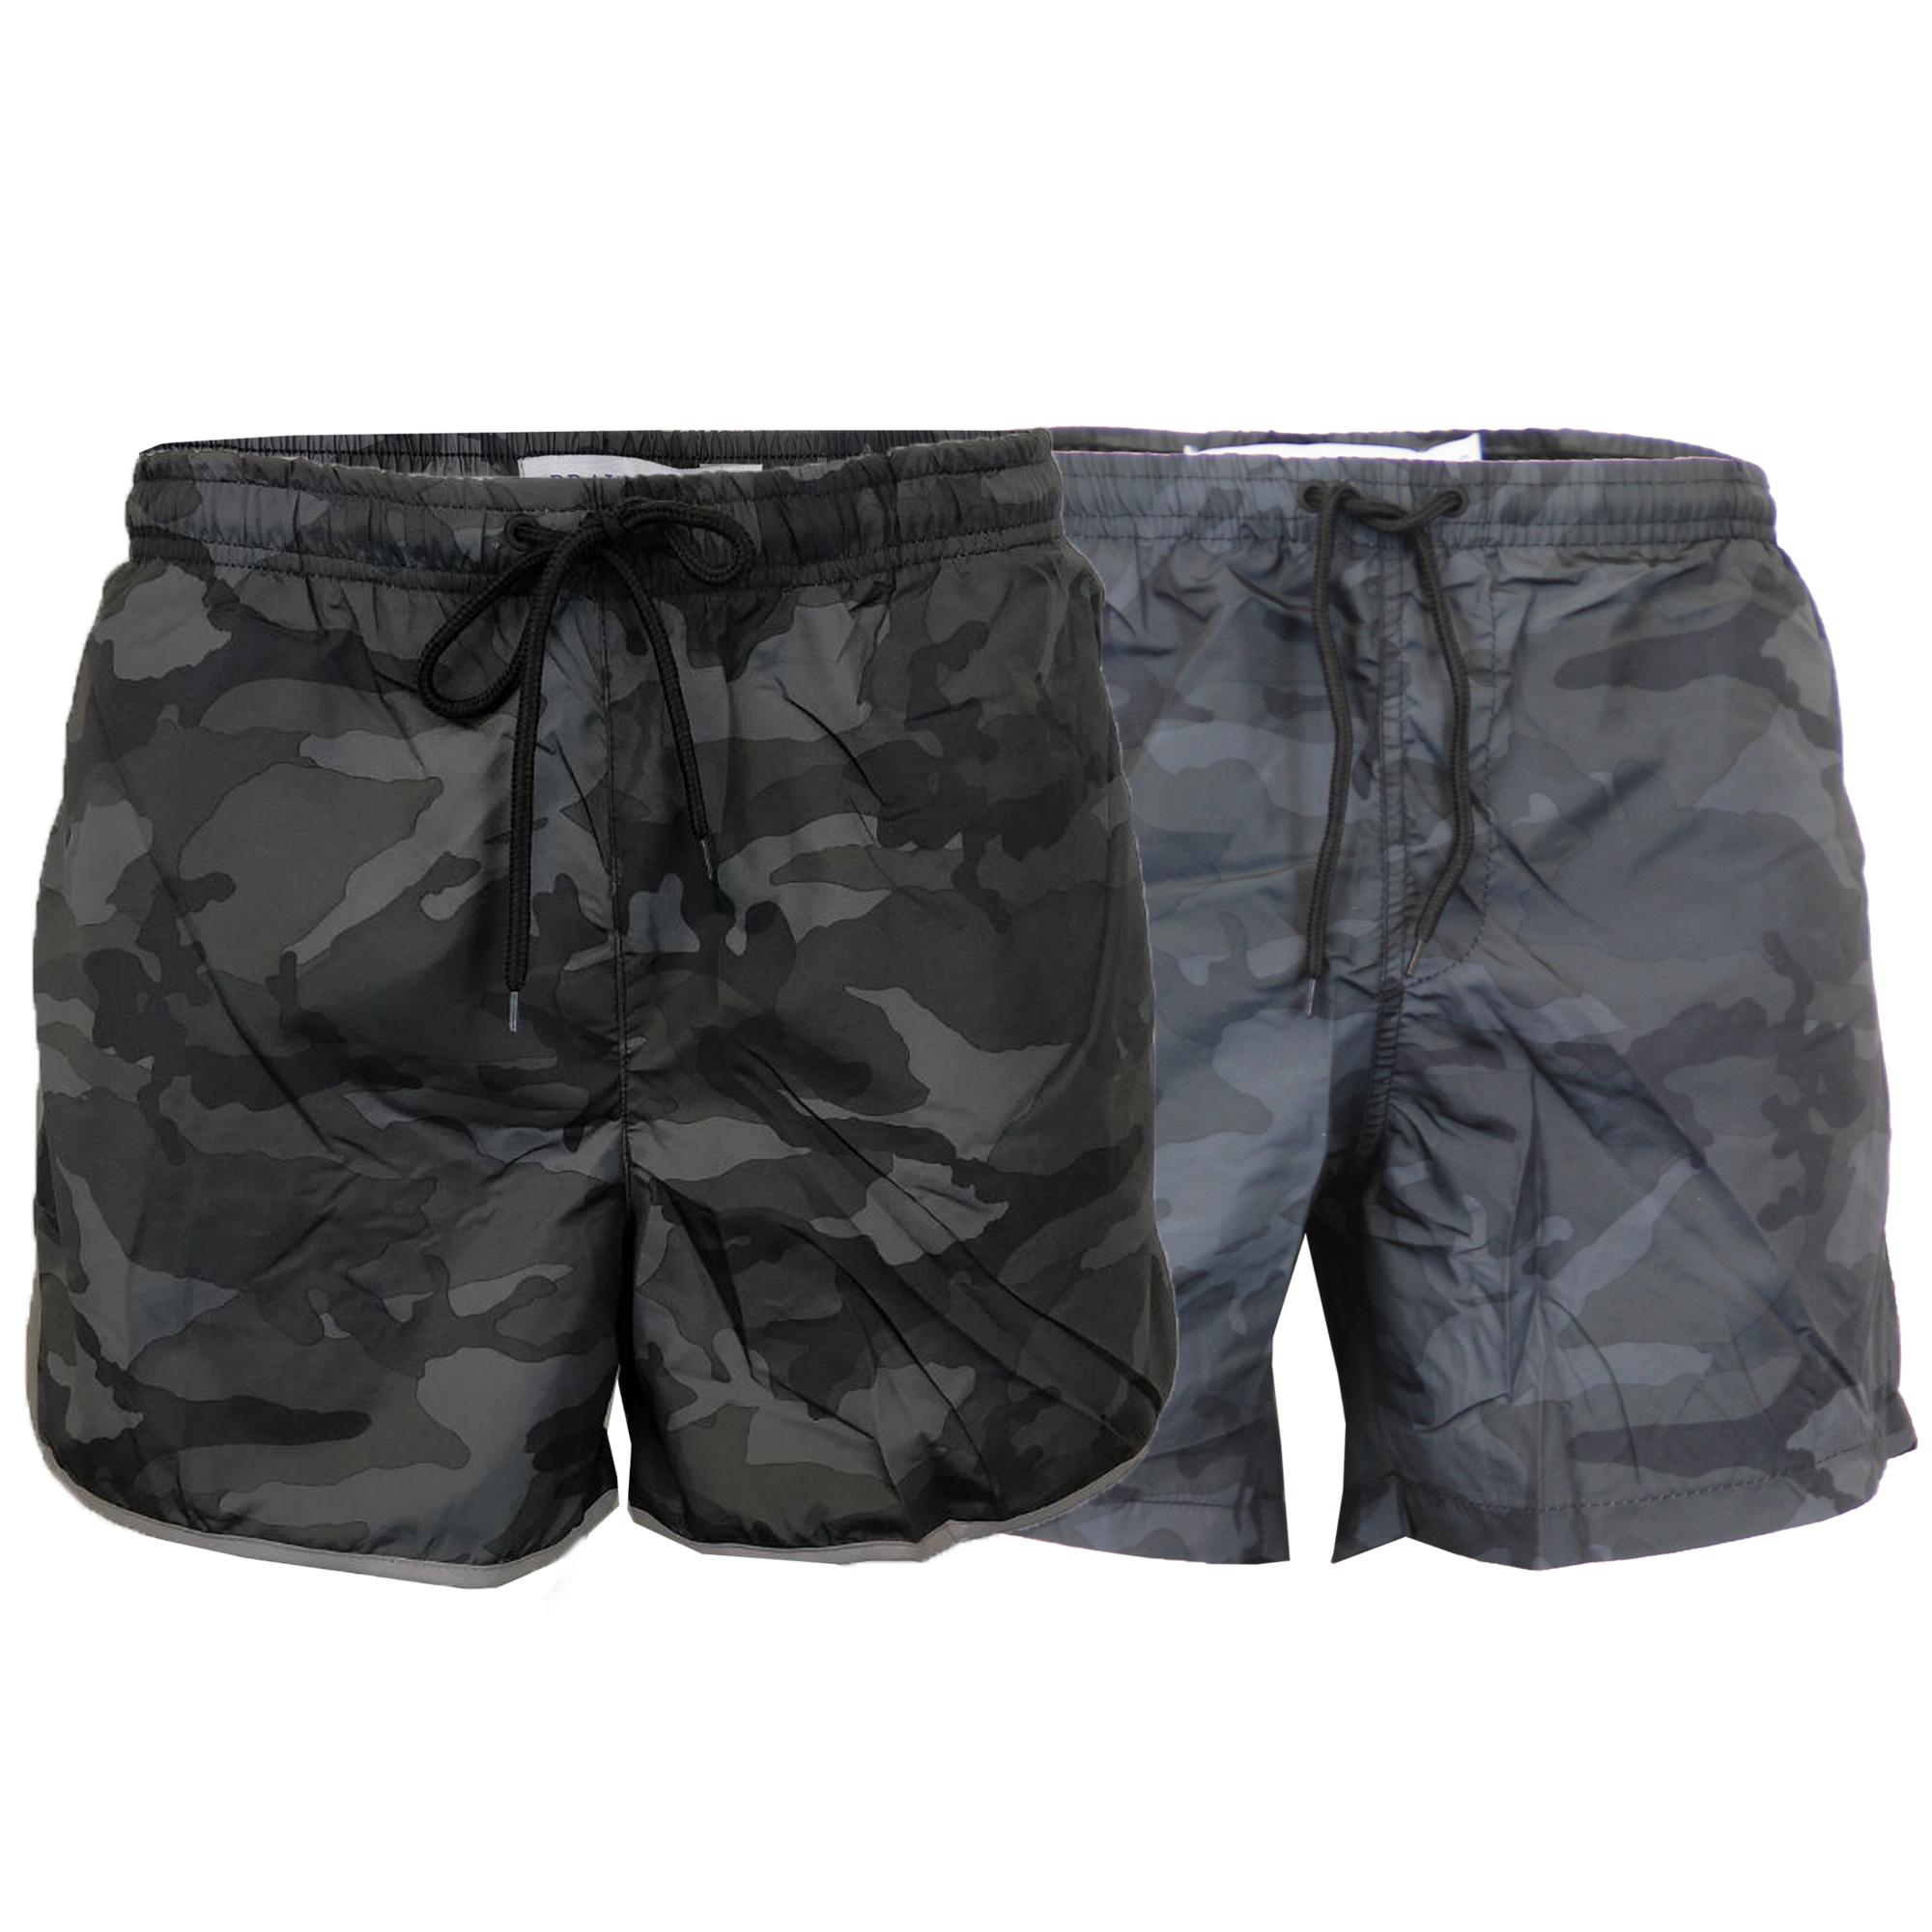 9098eb9321f9 Details about Mens Camo Swim Shorts Brave Soul Melbourne Military Conrad  Reflective Summer New